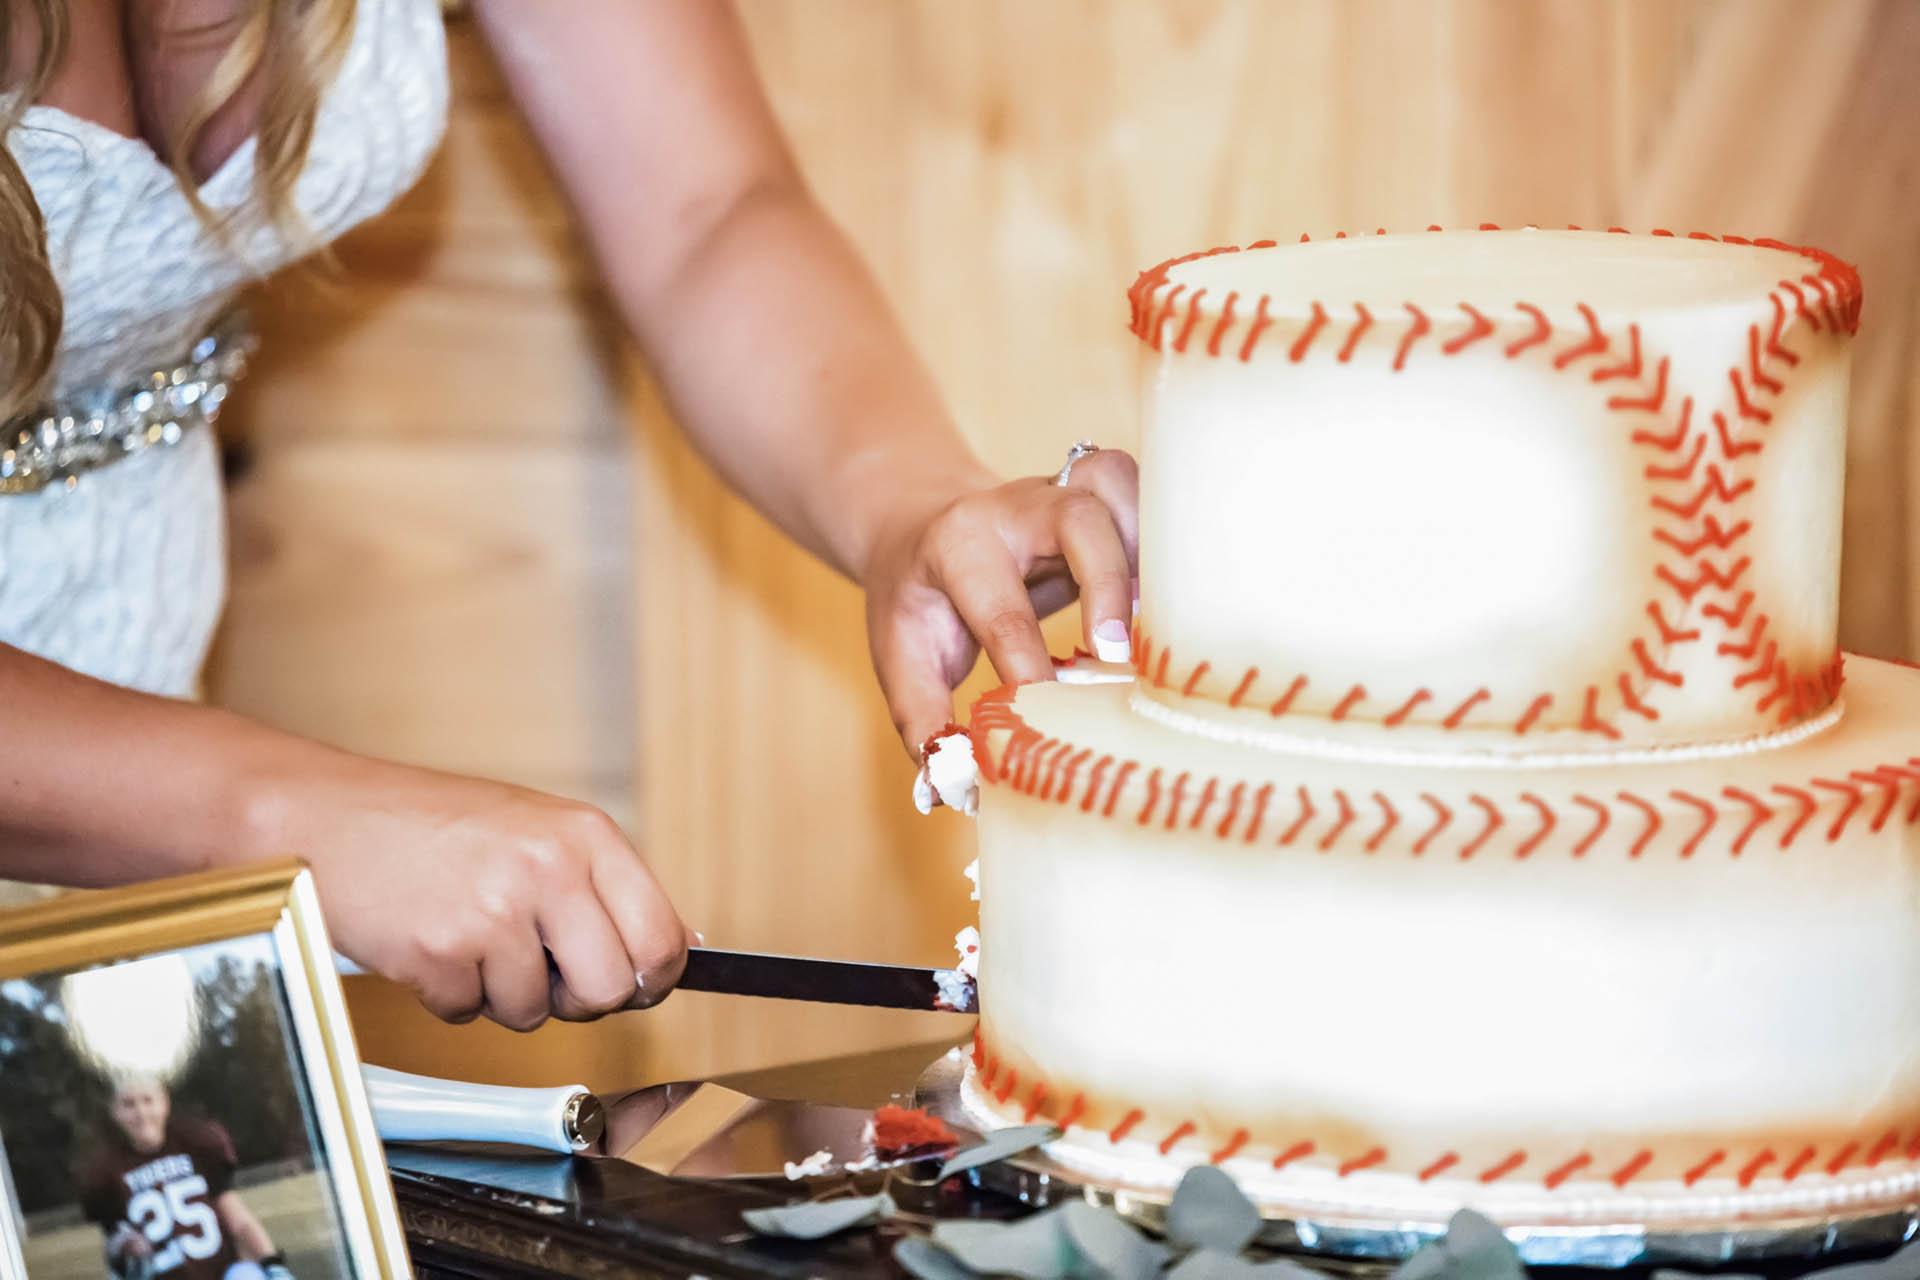 Bride cutting the wedding cake